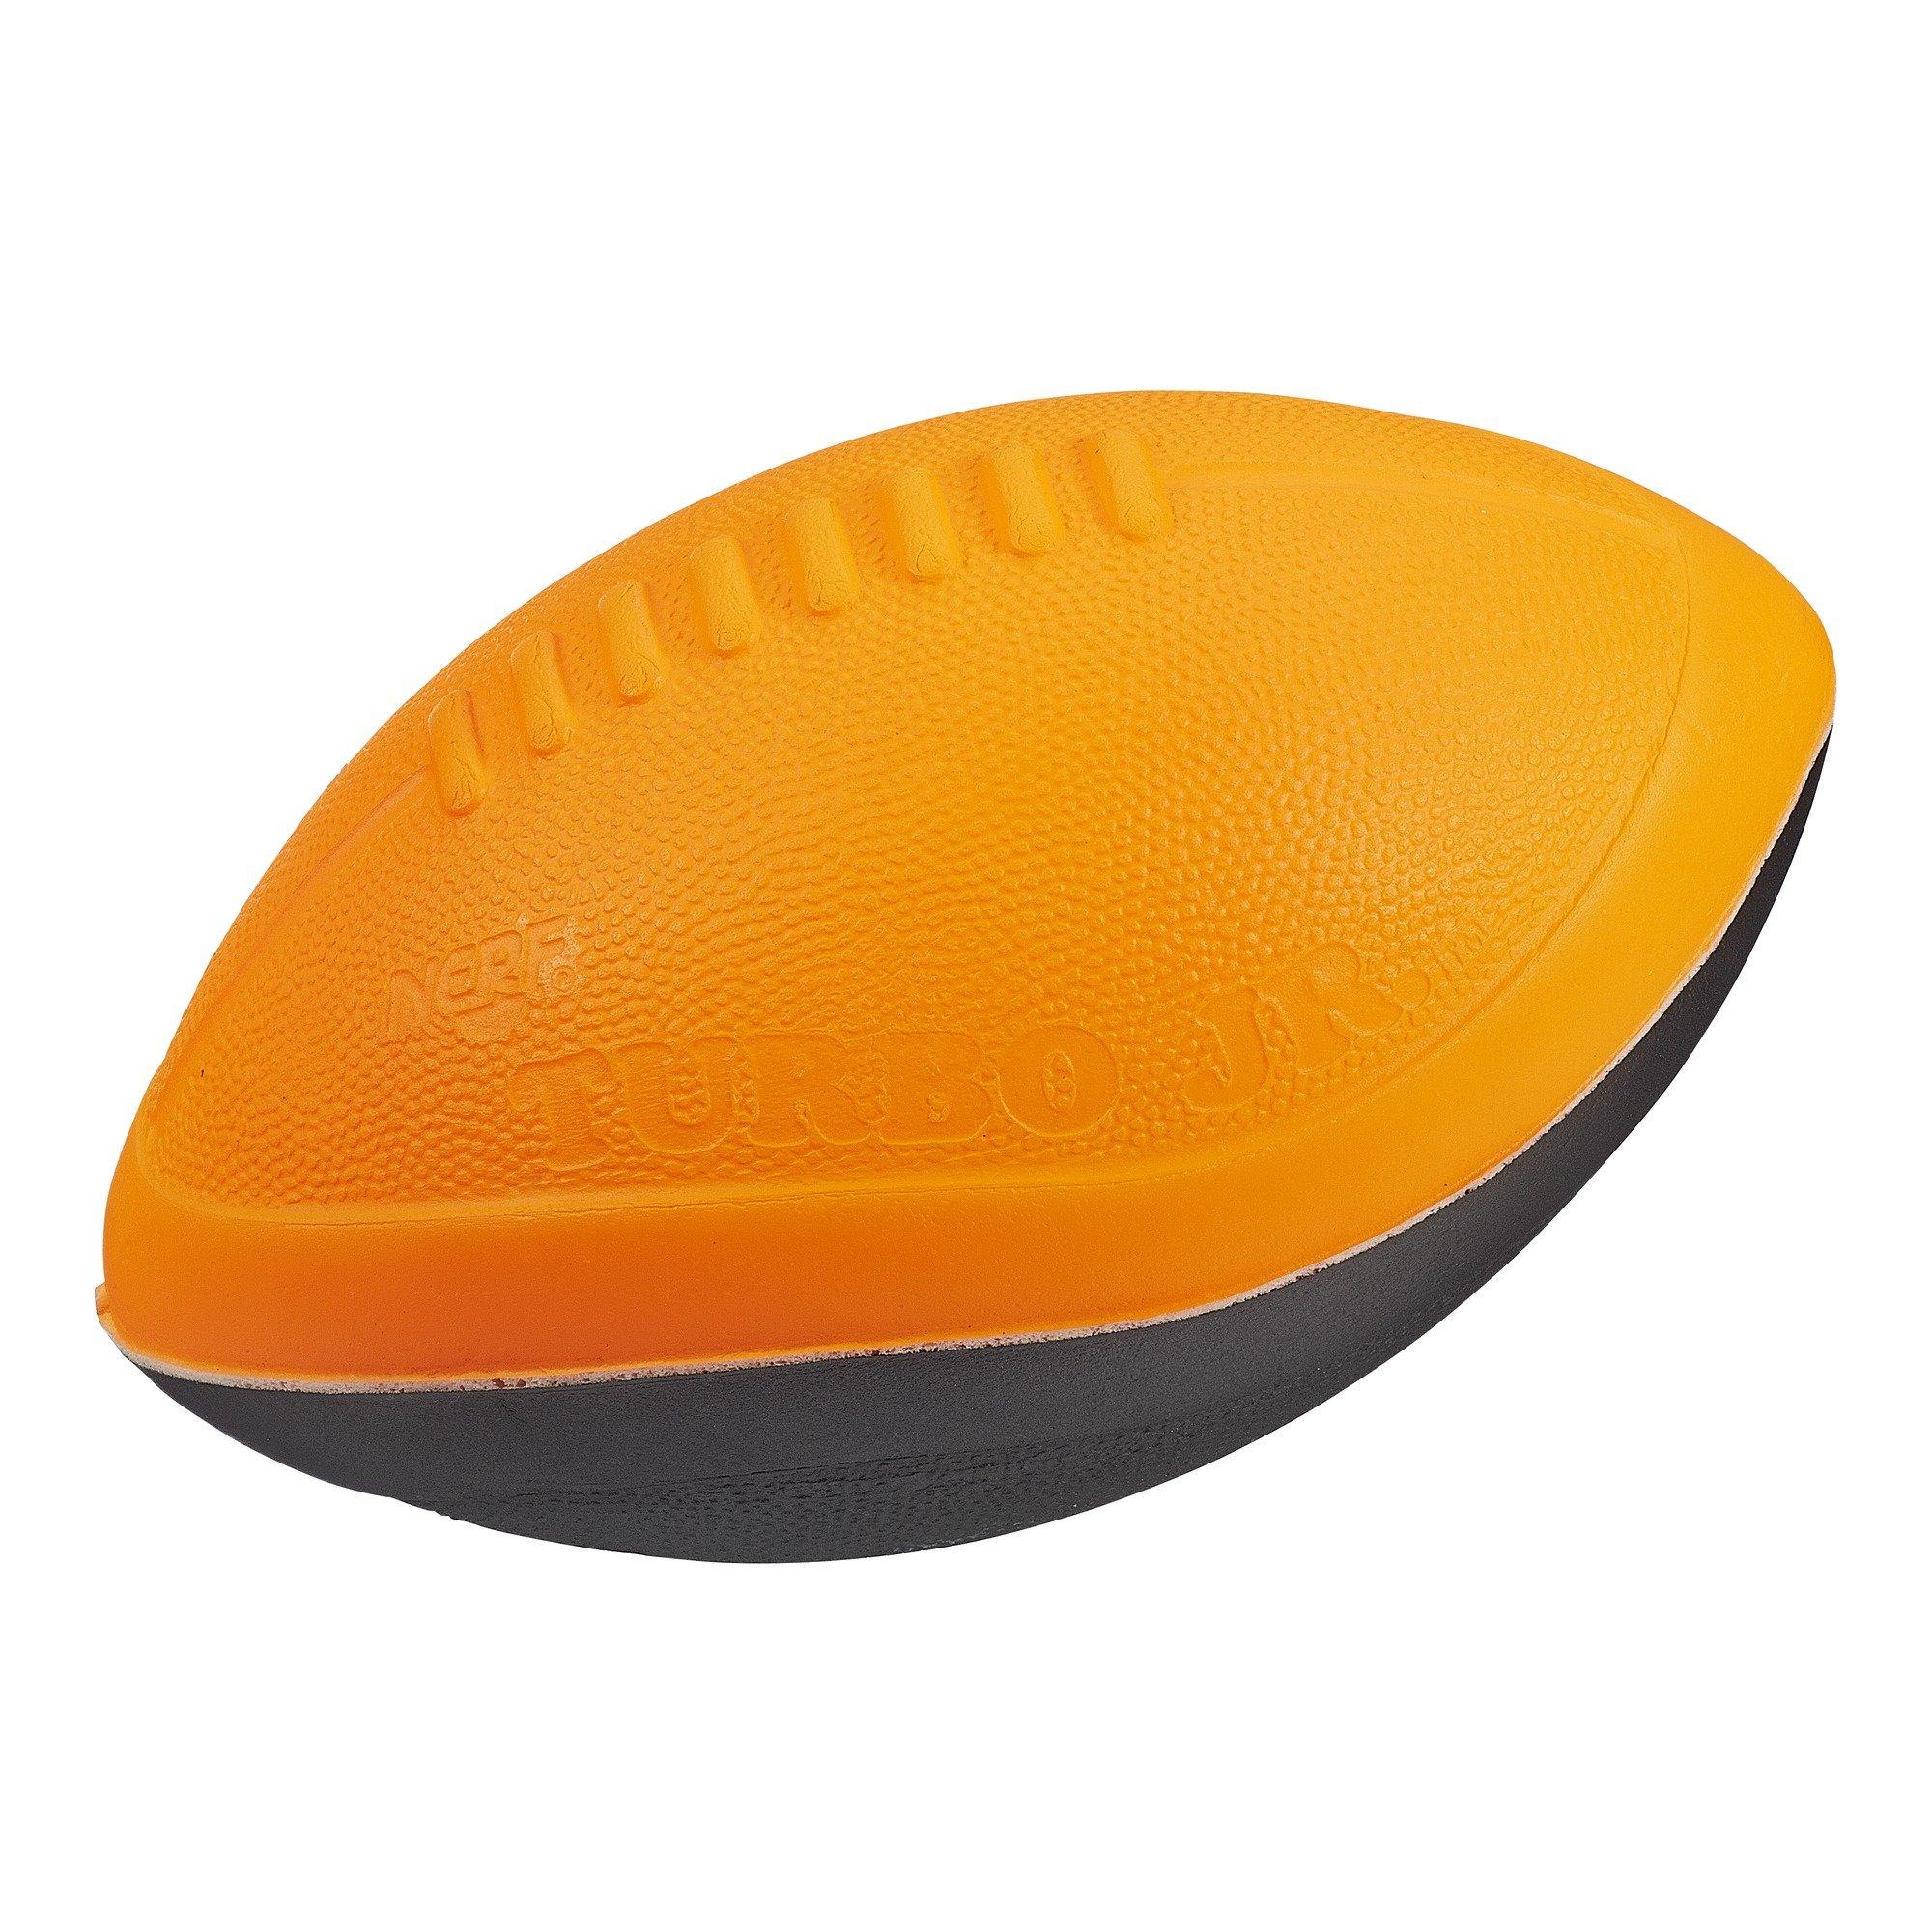 Nerf N-Sports Turbo Jr. Football by NERF